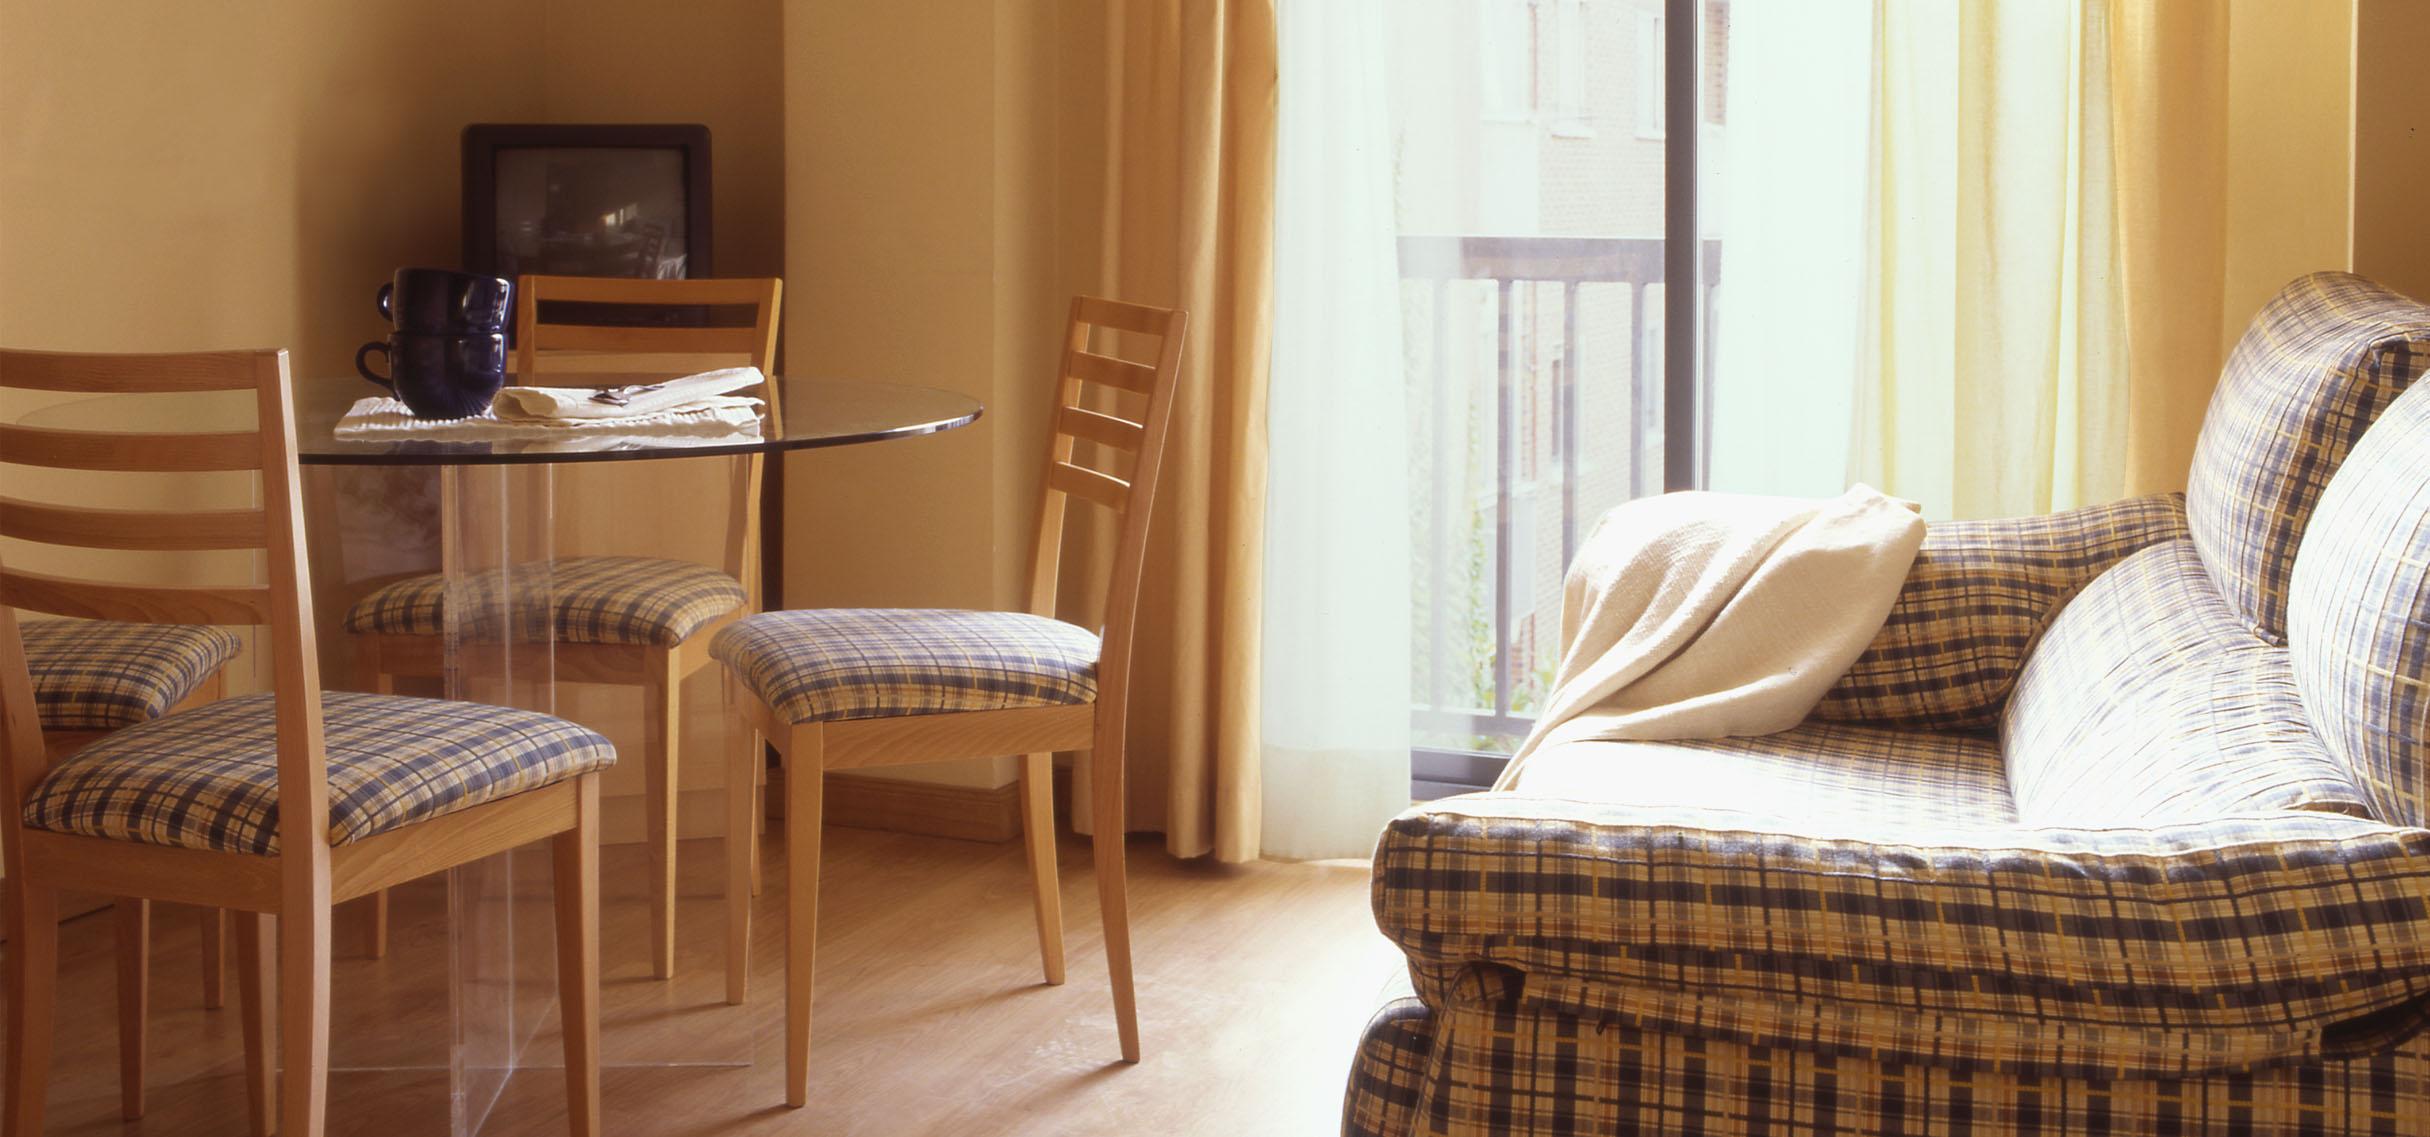 Alquiler apartamentos amueblados en madrid por meses for Pisos alquiler clot baratos